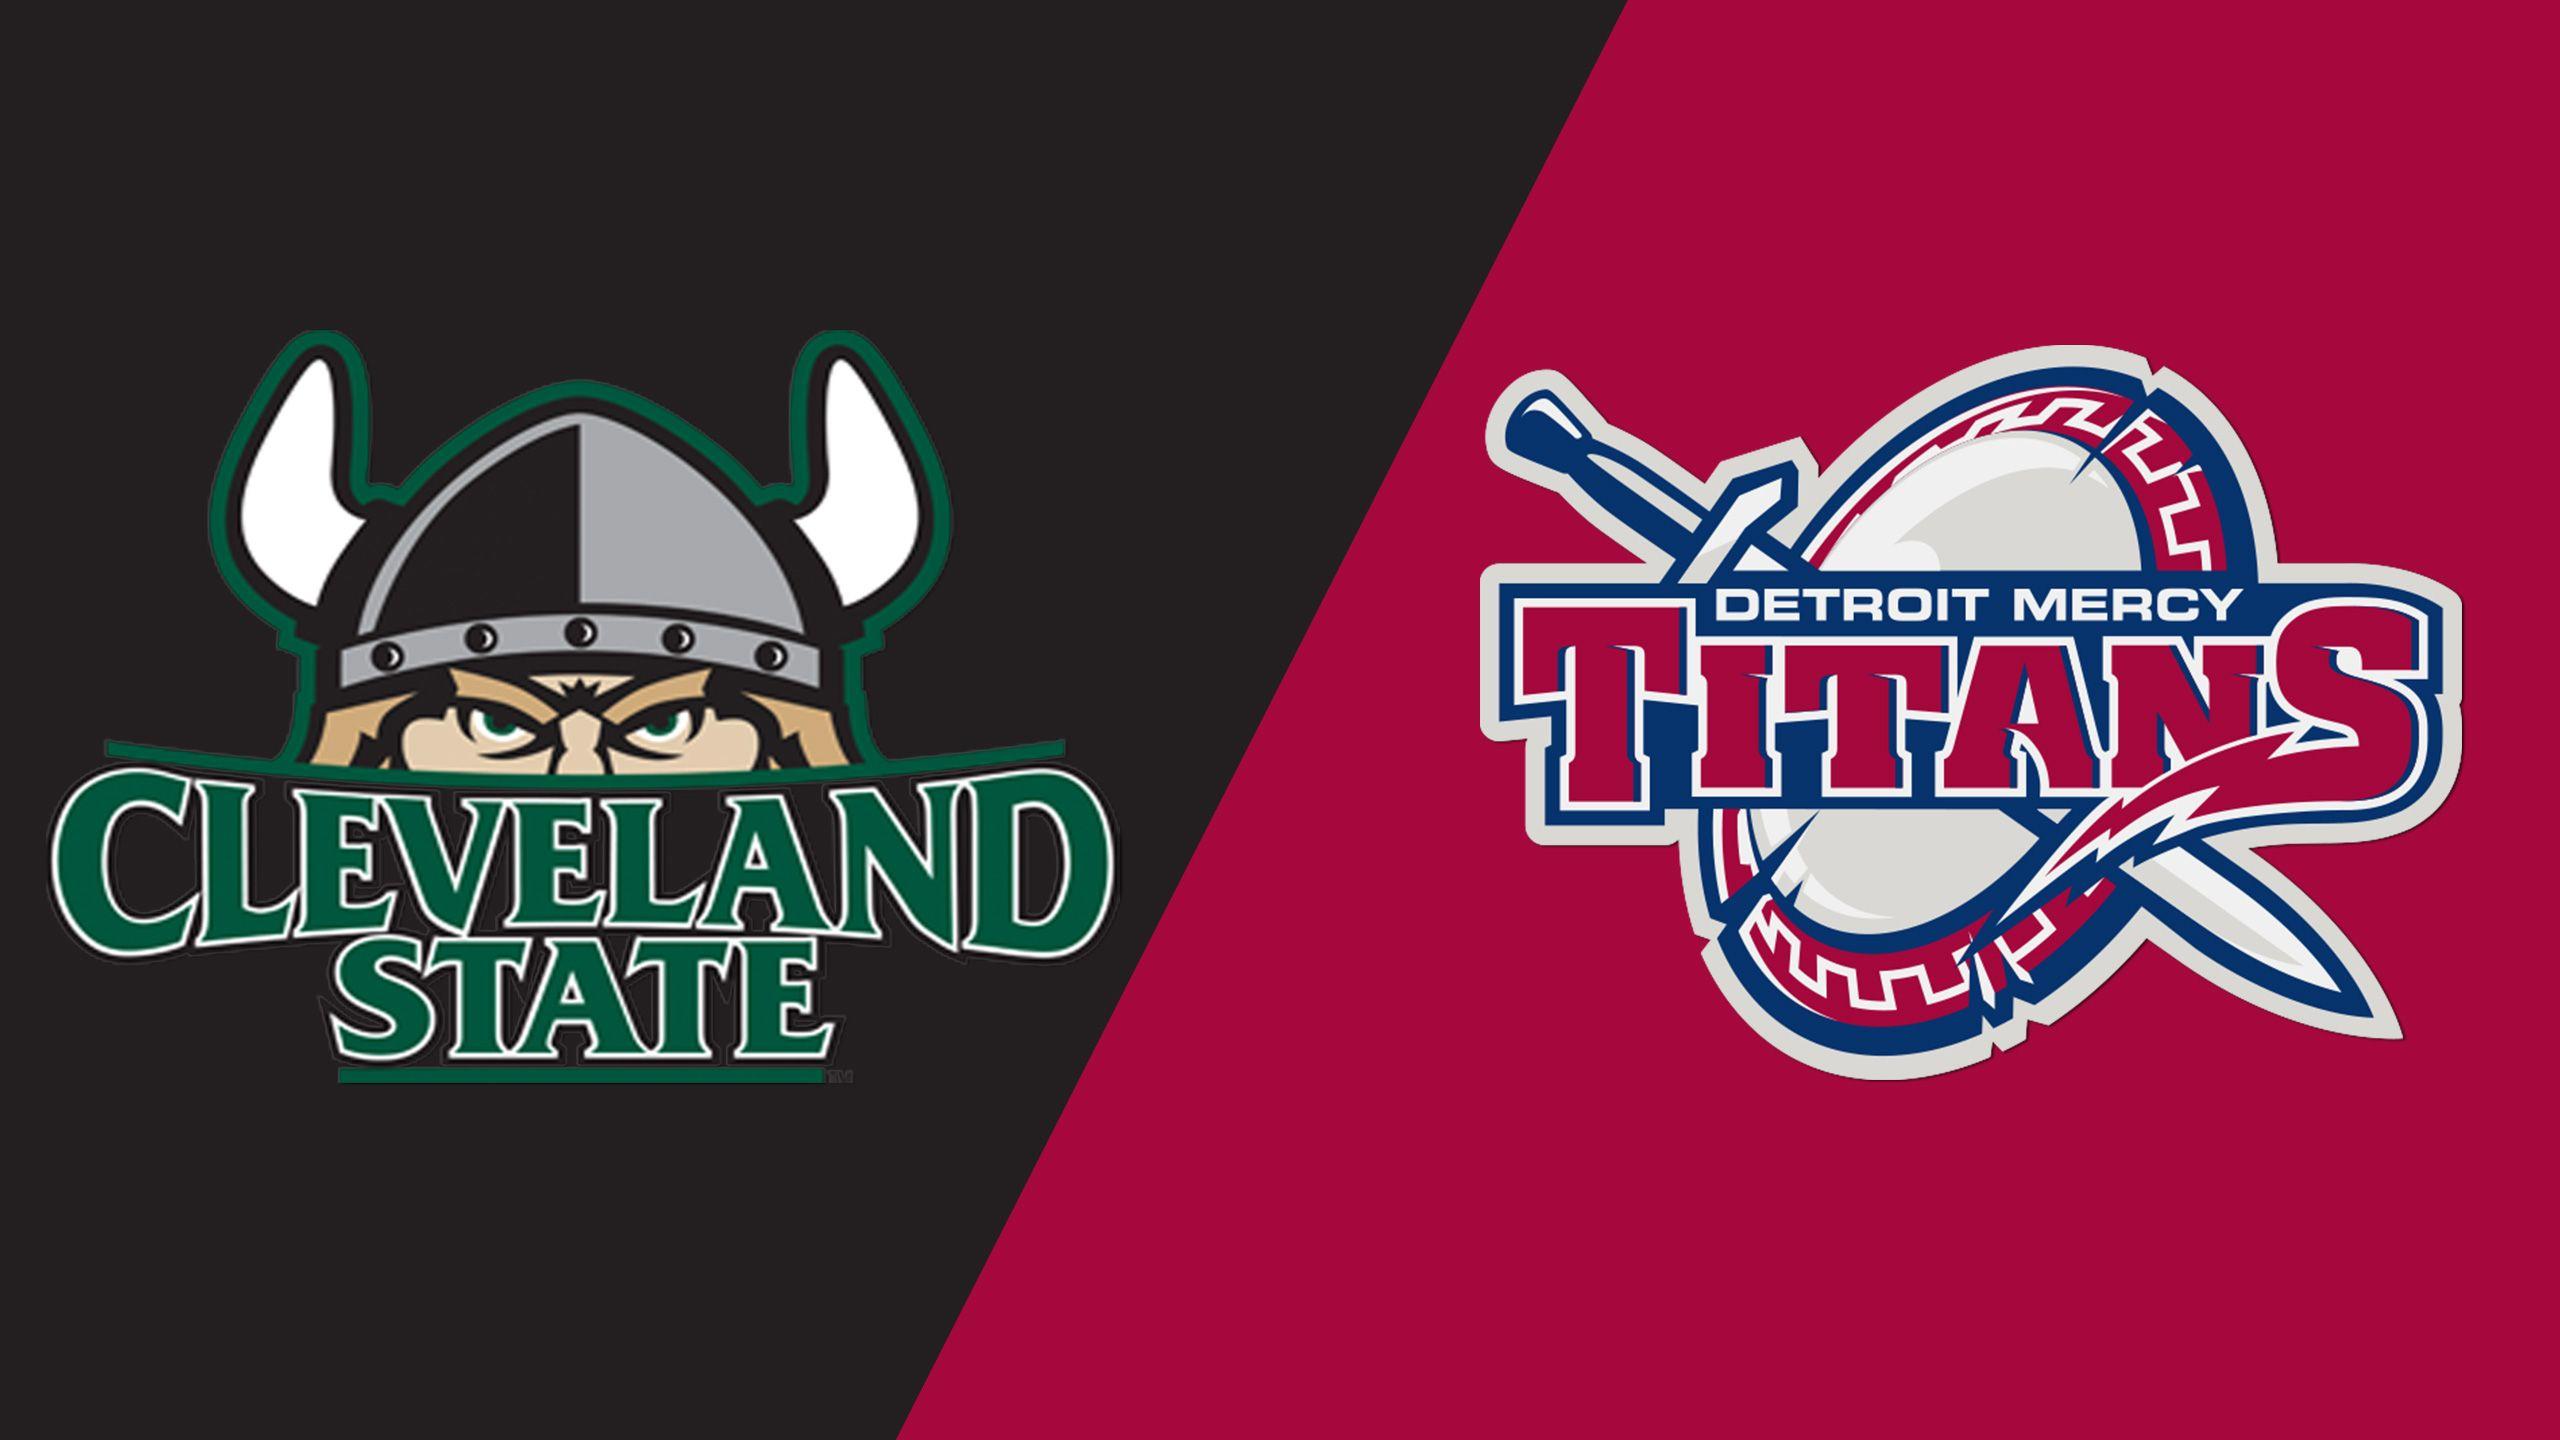 Cleveland State vs. Detroit Mercy (Softball)